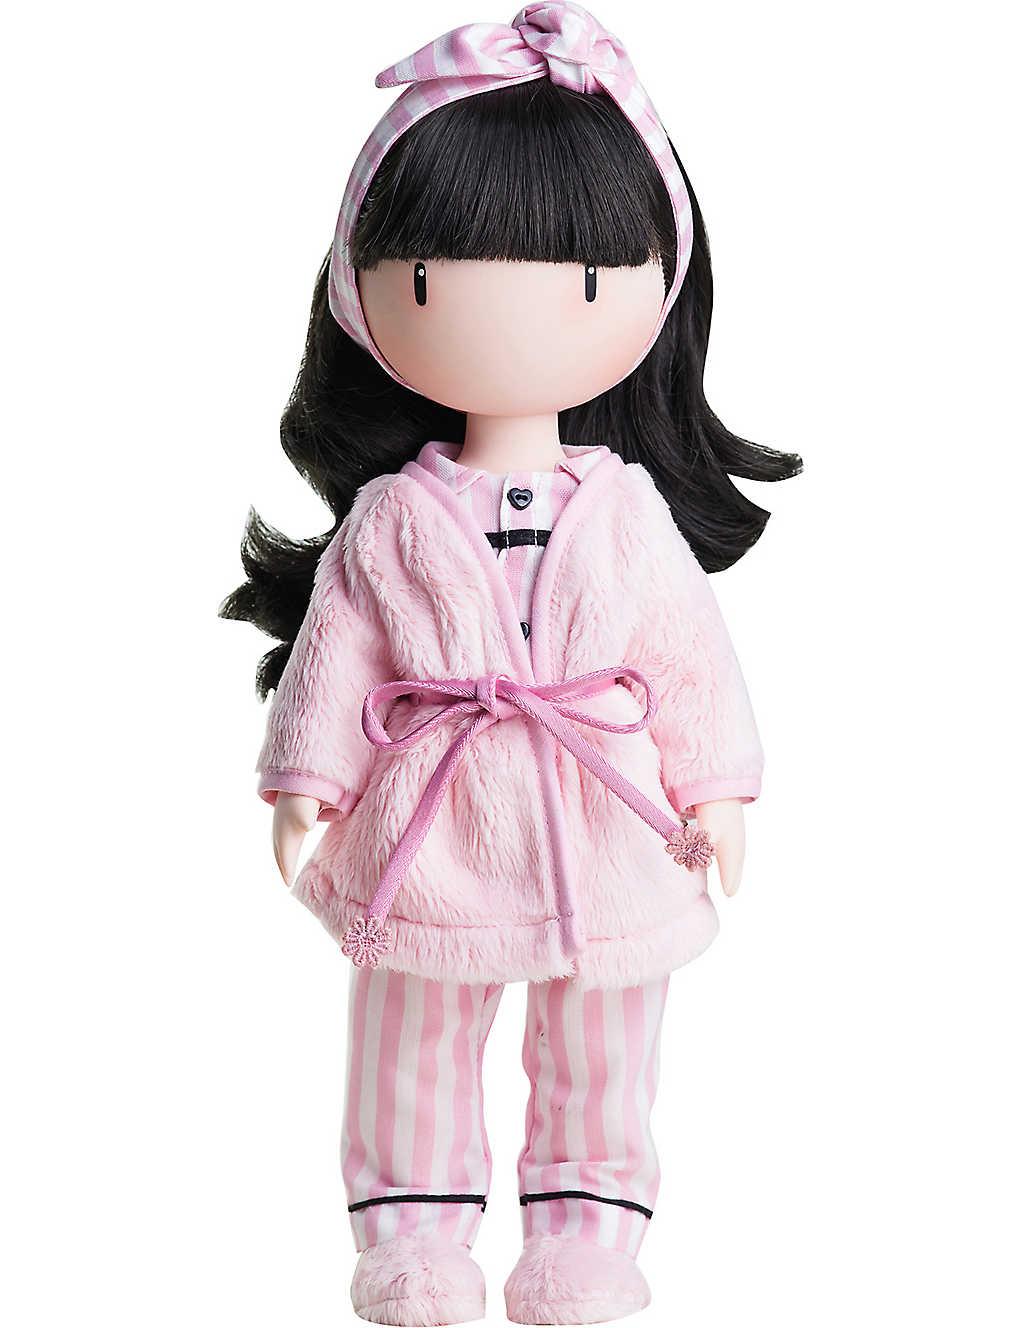 806679789c1 GORJUSS DOLLS - Goodnight outfit | Selfridges.com